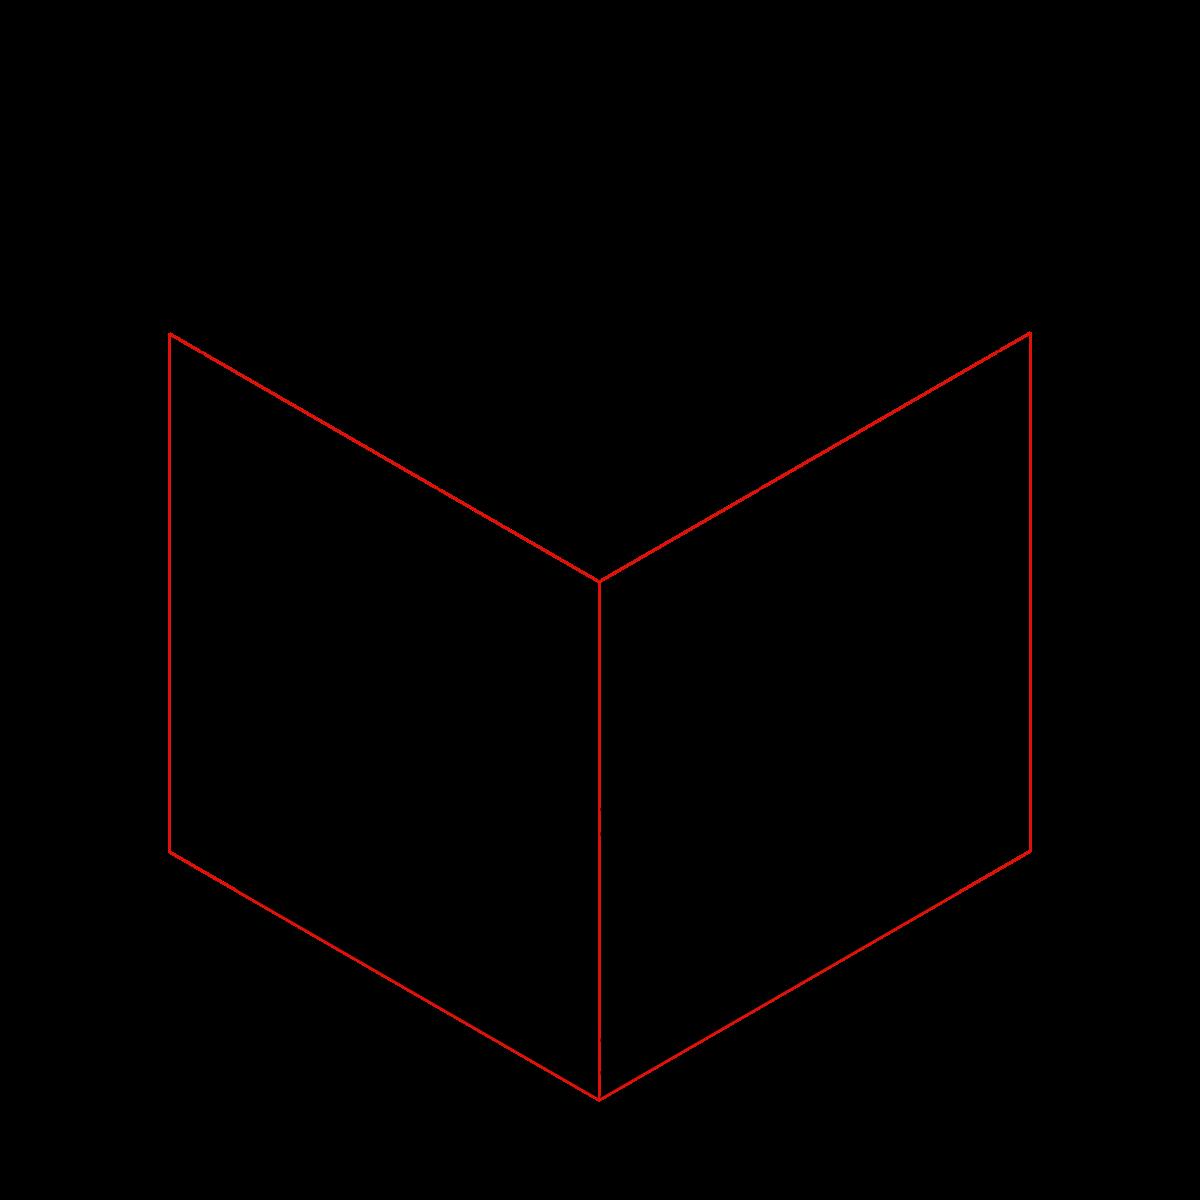 Revestimiento exterior policarbonato ef04174b 2bfd 42d7 9045 13033078bb3b